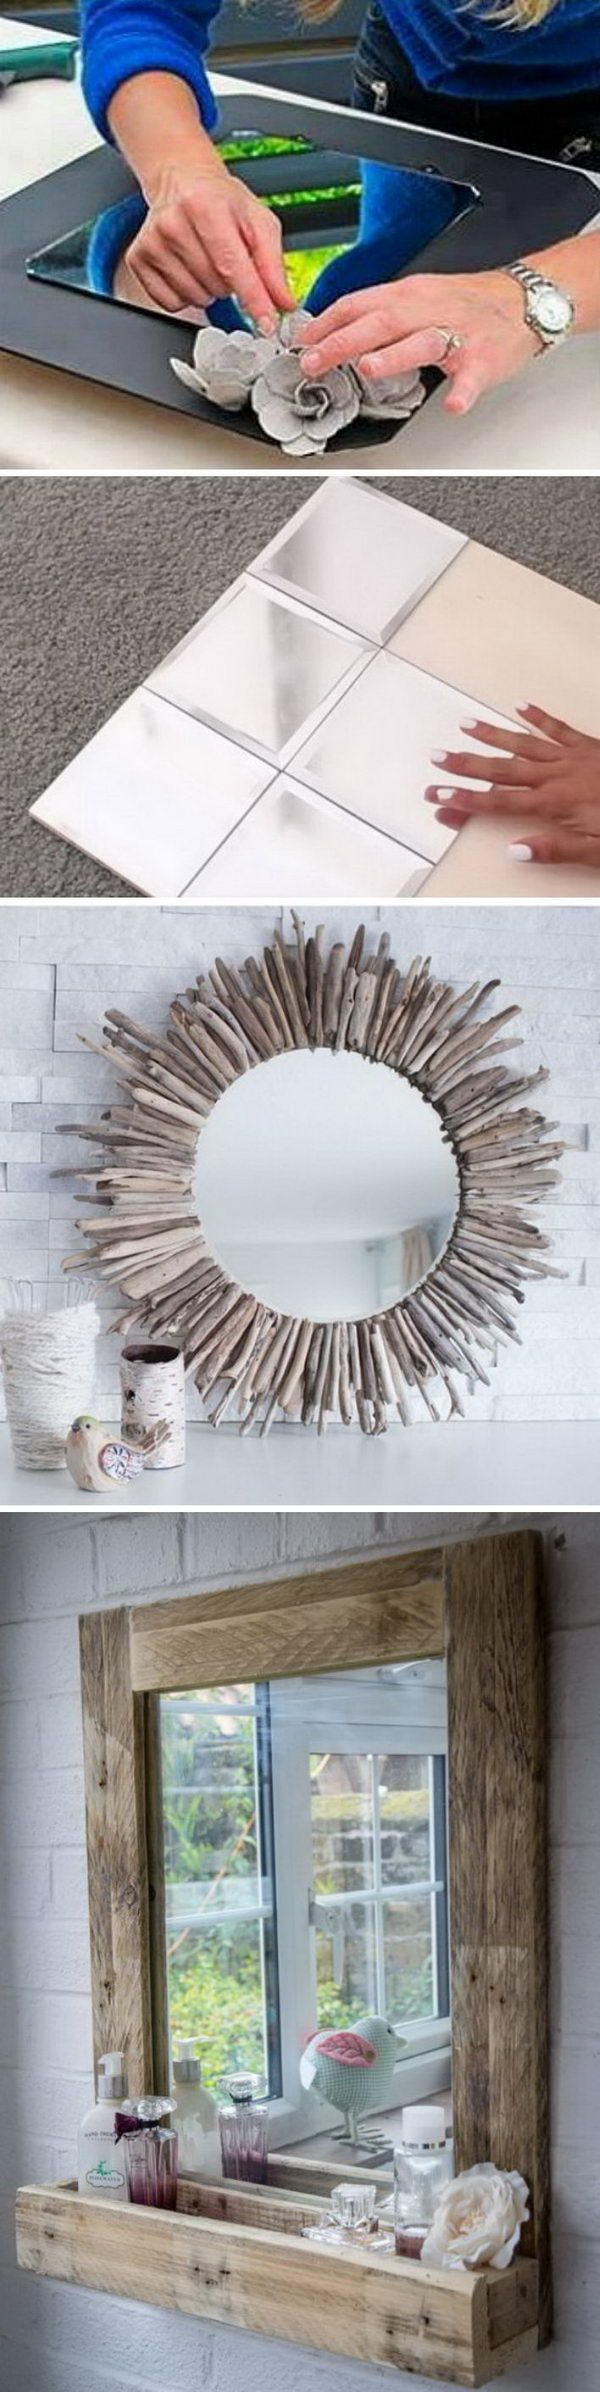 best 25+ mirror crafts ideas on pinterest | mirror ideas, spoon